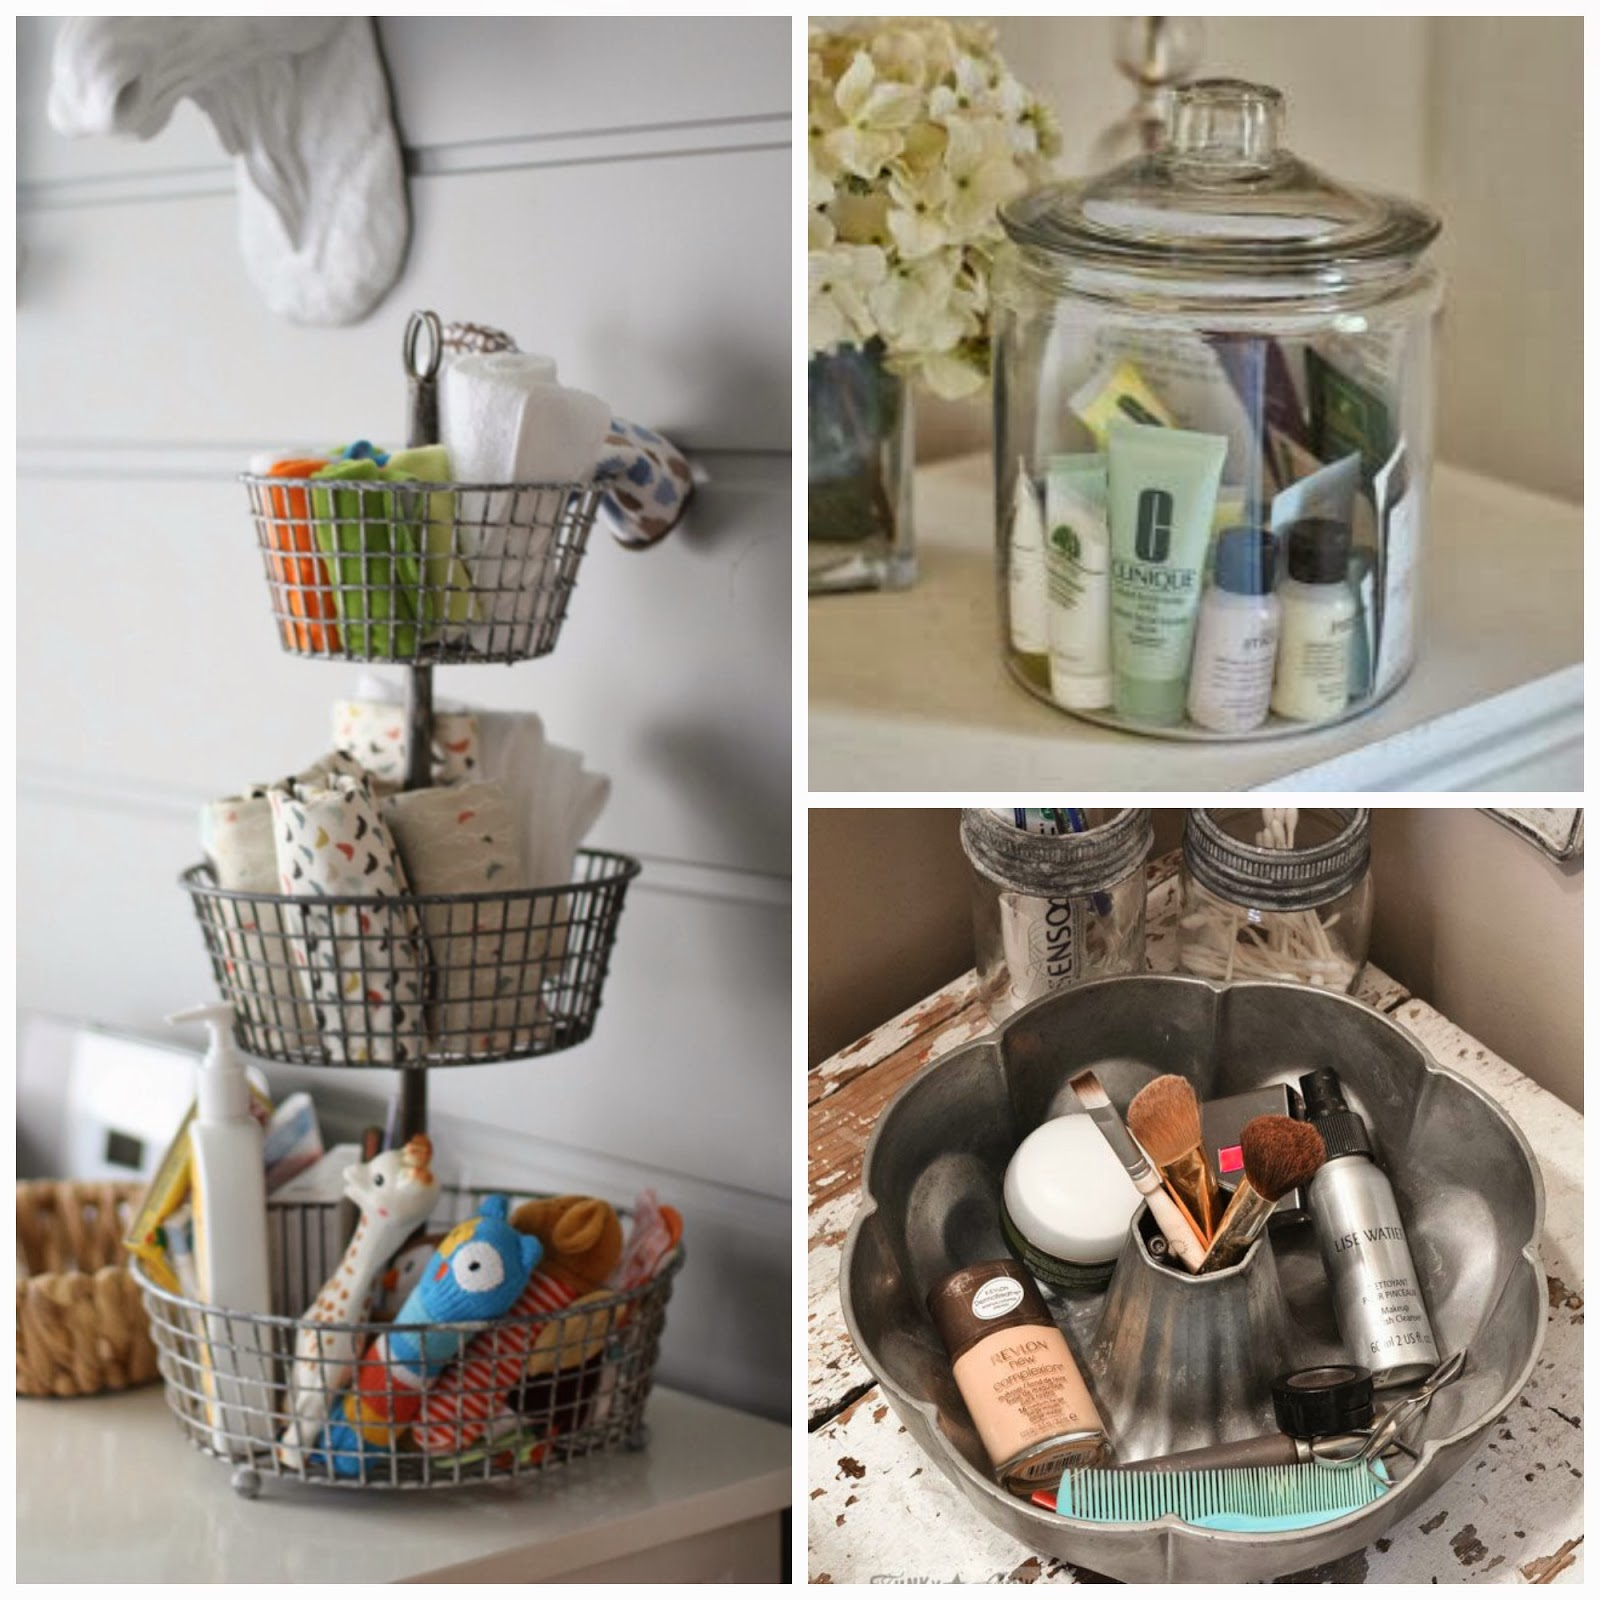 Decorative Bathroom Counter Storage : Craftivity designs week organizing challenge bathroom